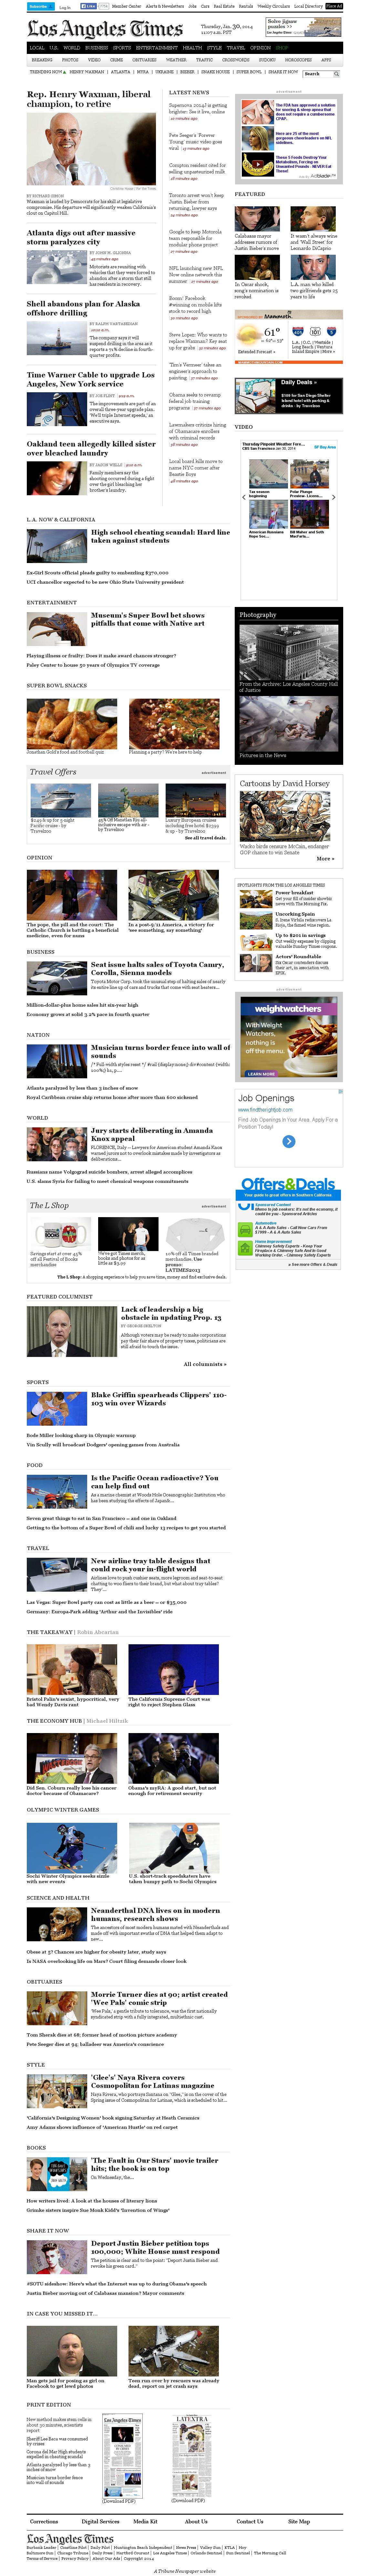 Los Angeles Times at Thursday Jan. 30, 2014, 7:11 p.m. UTC